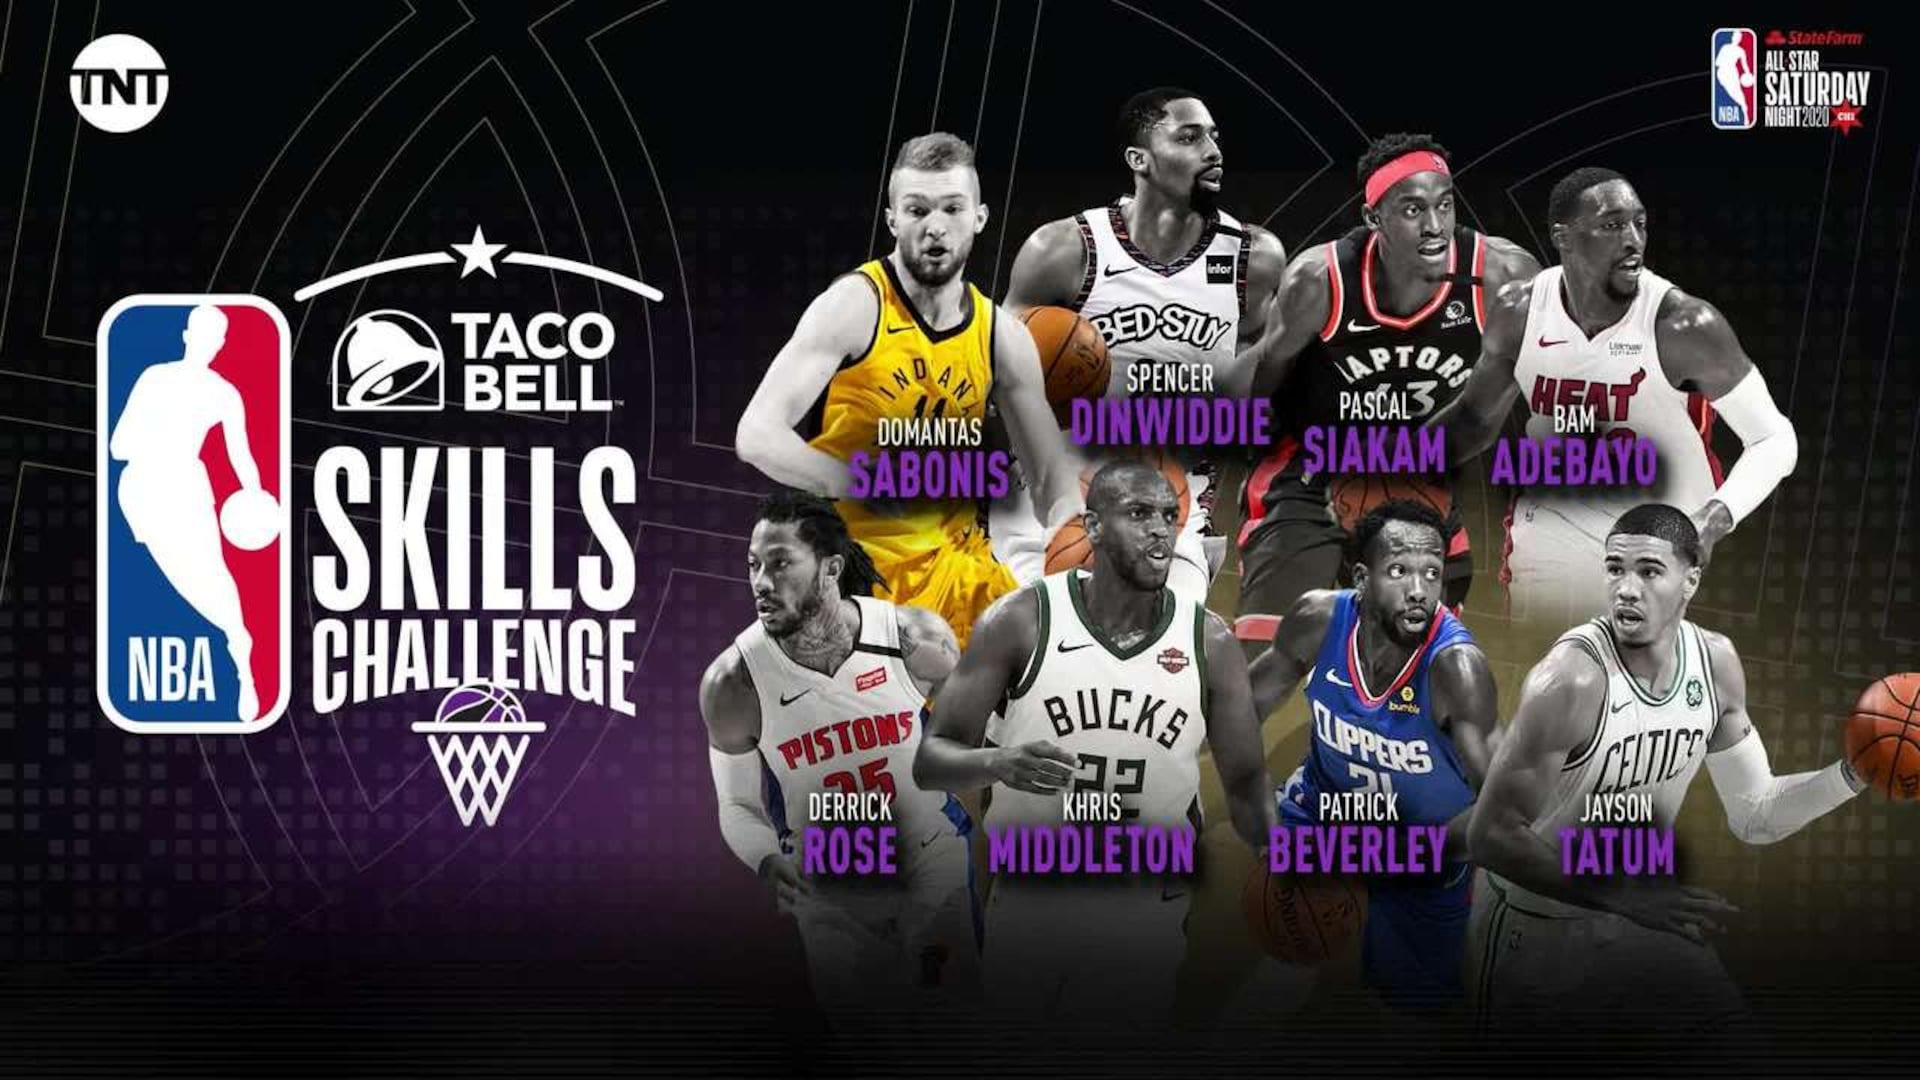 Taco Bell Skills Challenge competitors NBAcom 1920x1080